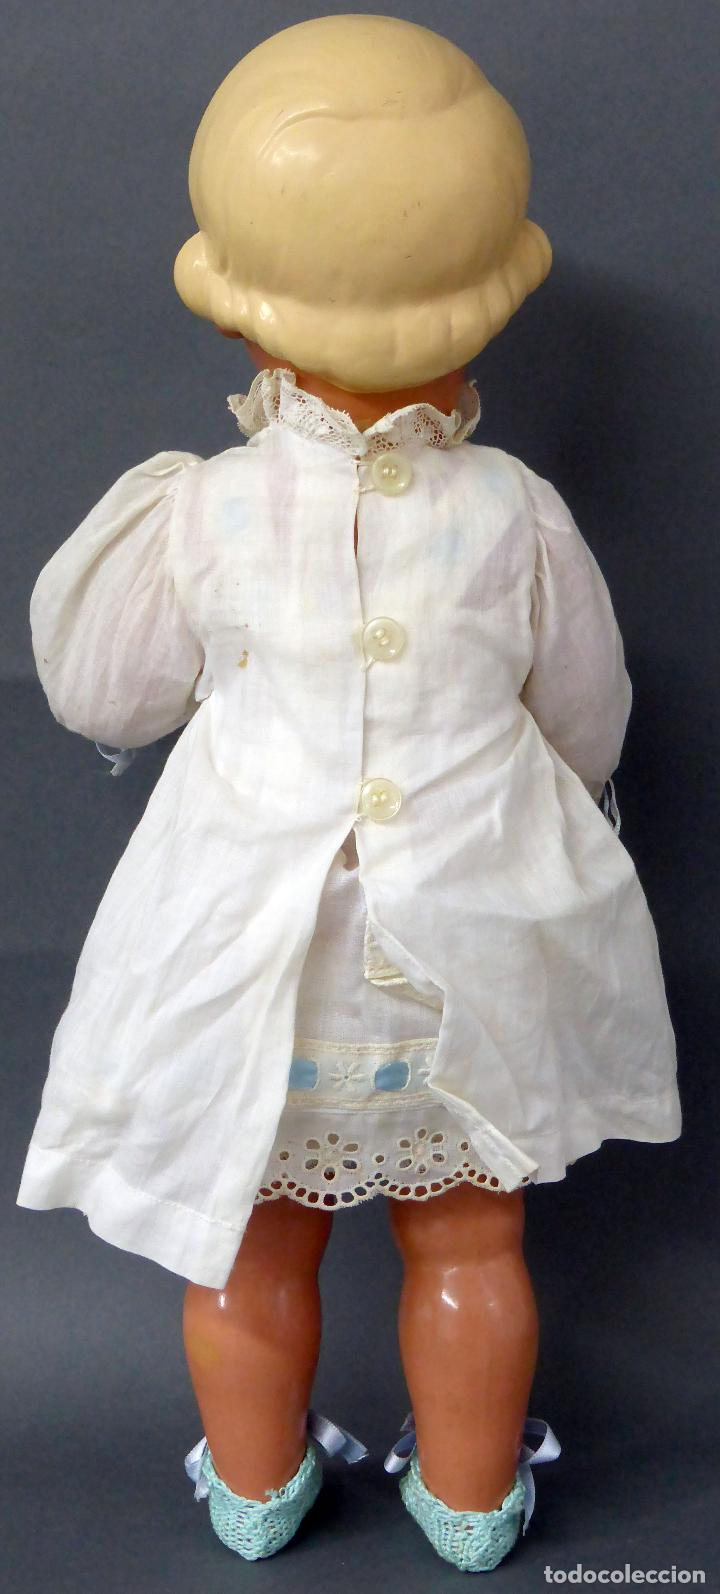 Muñecas Celuloide: Muñeca celuloide La Tortuga 45 Schildkrot marca espalda ropa original años 30 45 cm alto - Foto 6 - 88976408